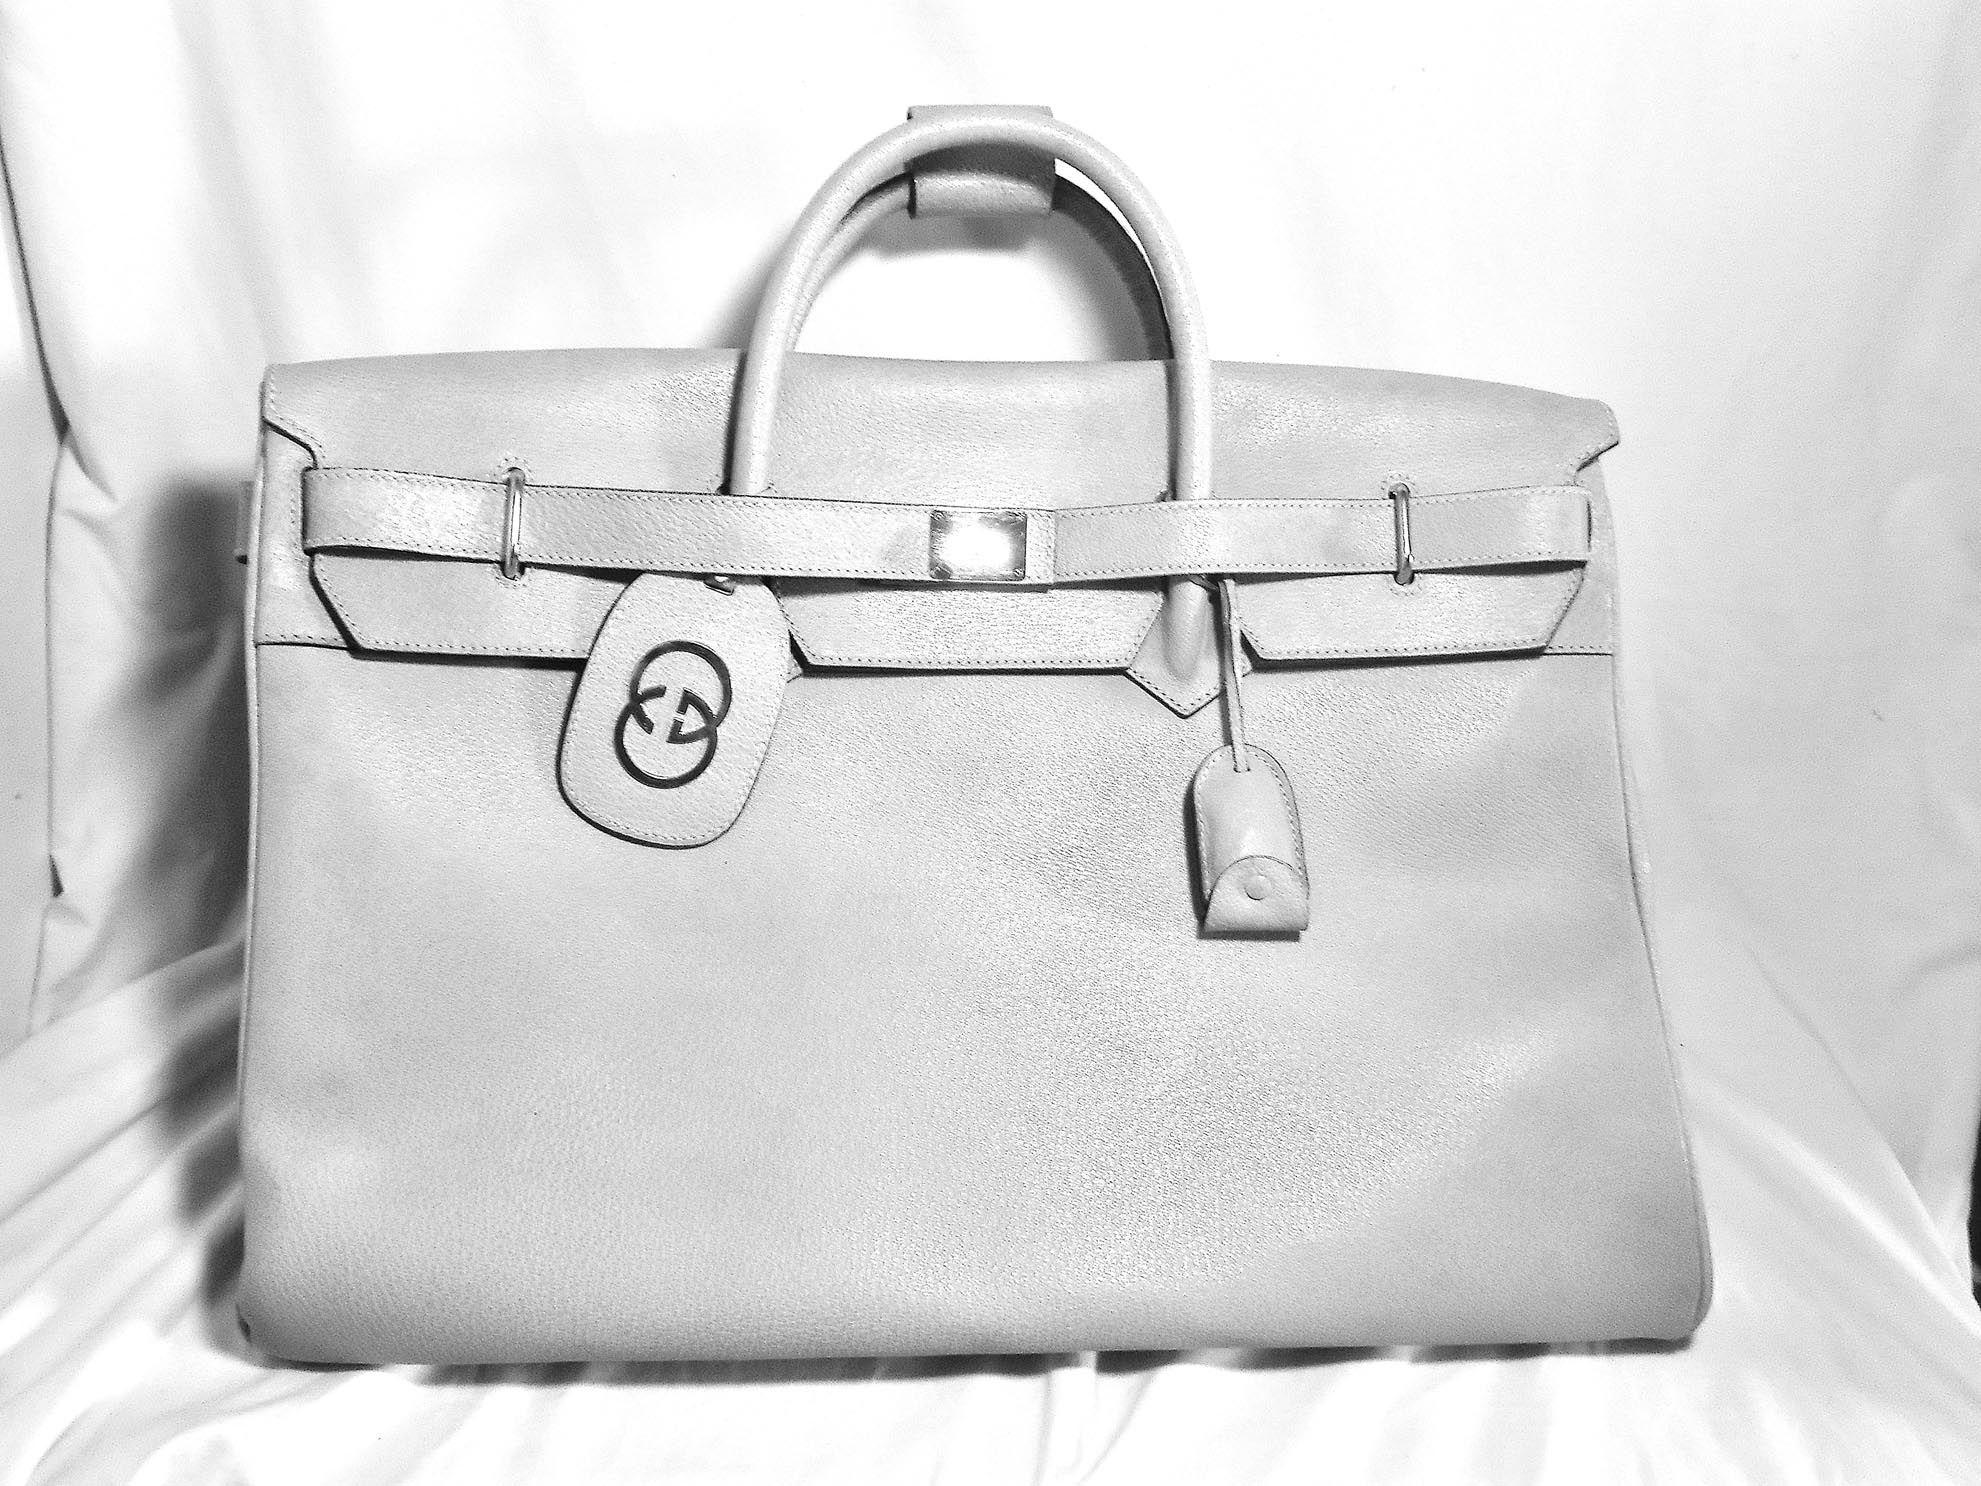 edf4b97ef37 Hermes Birkin, Michael Kors Hamilton, Fashion Models, Luxury, Handbags,  Classic,